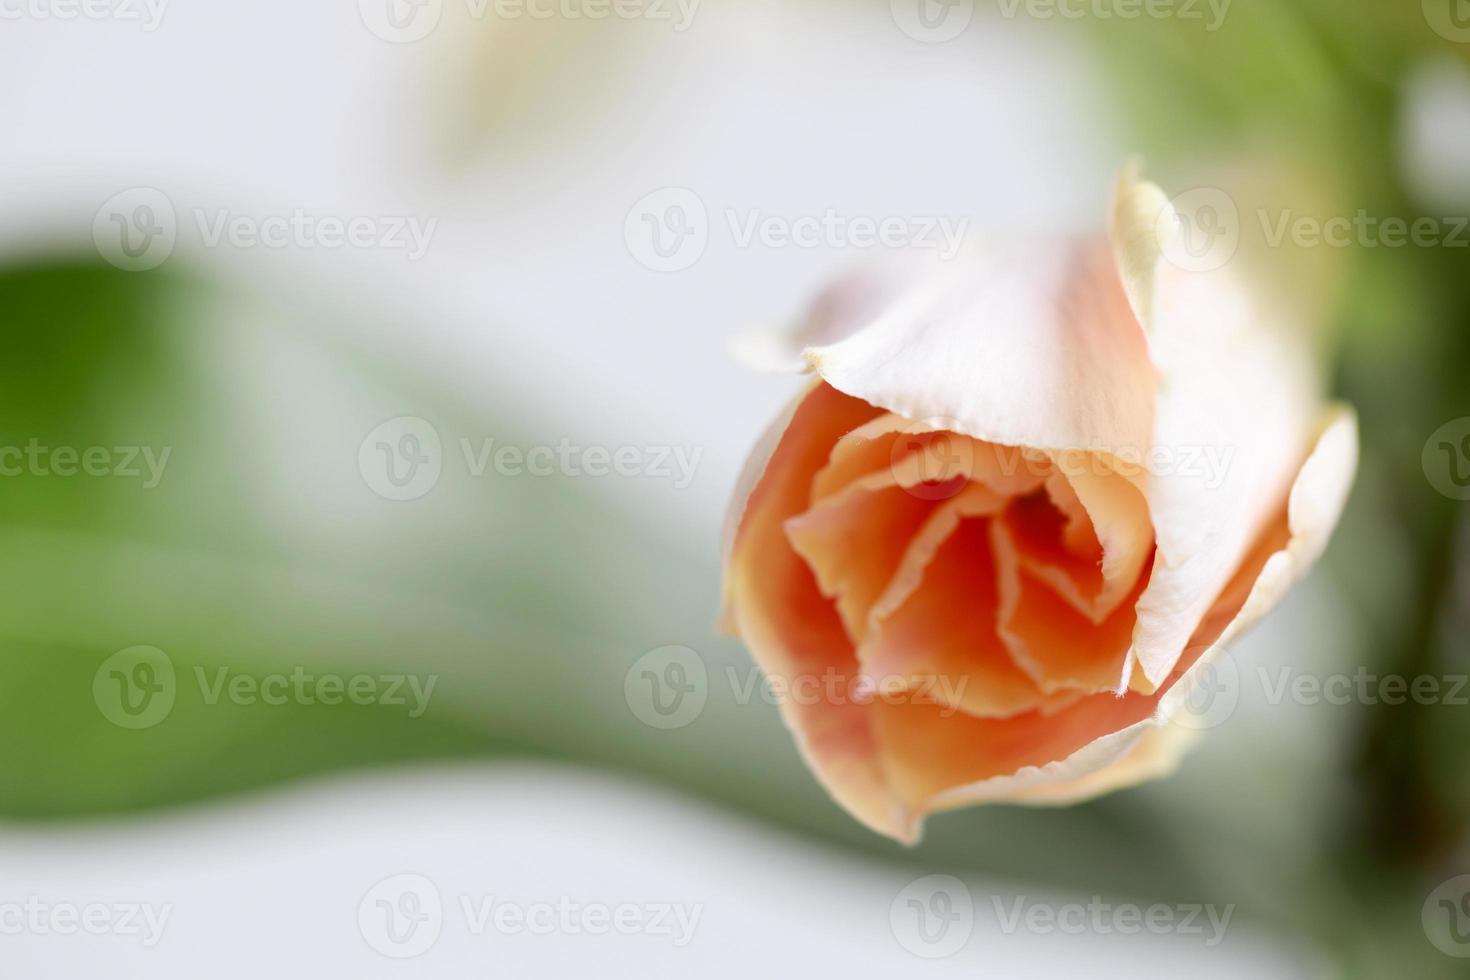 woestijnrozen bloem foto